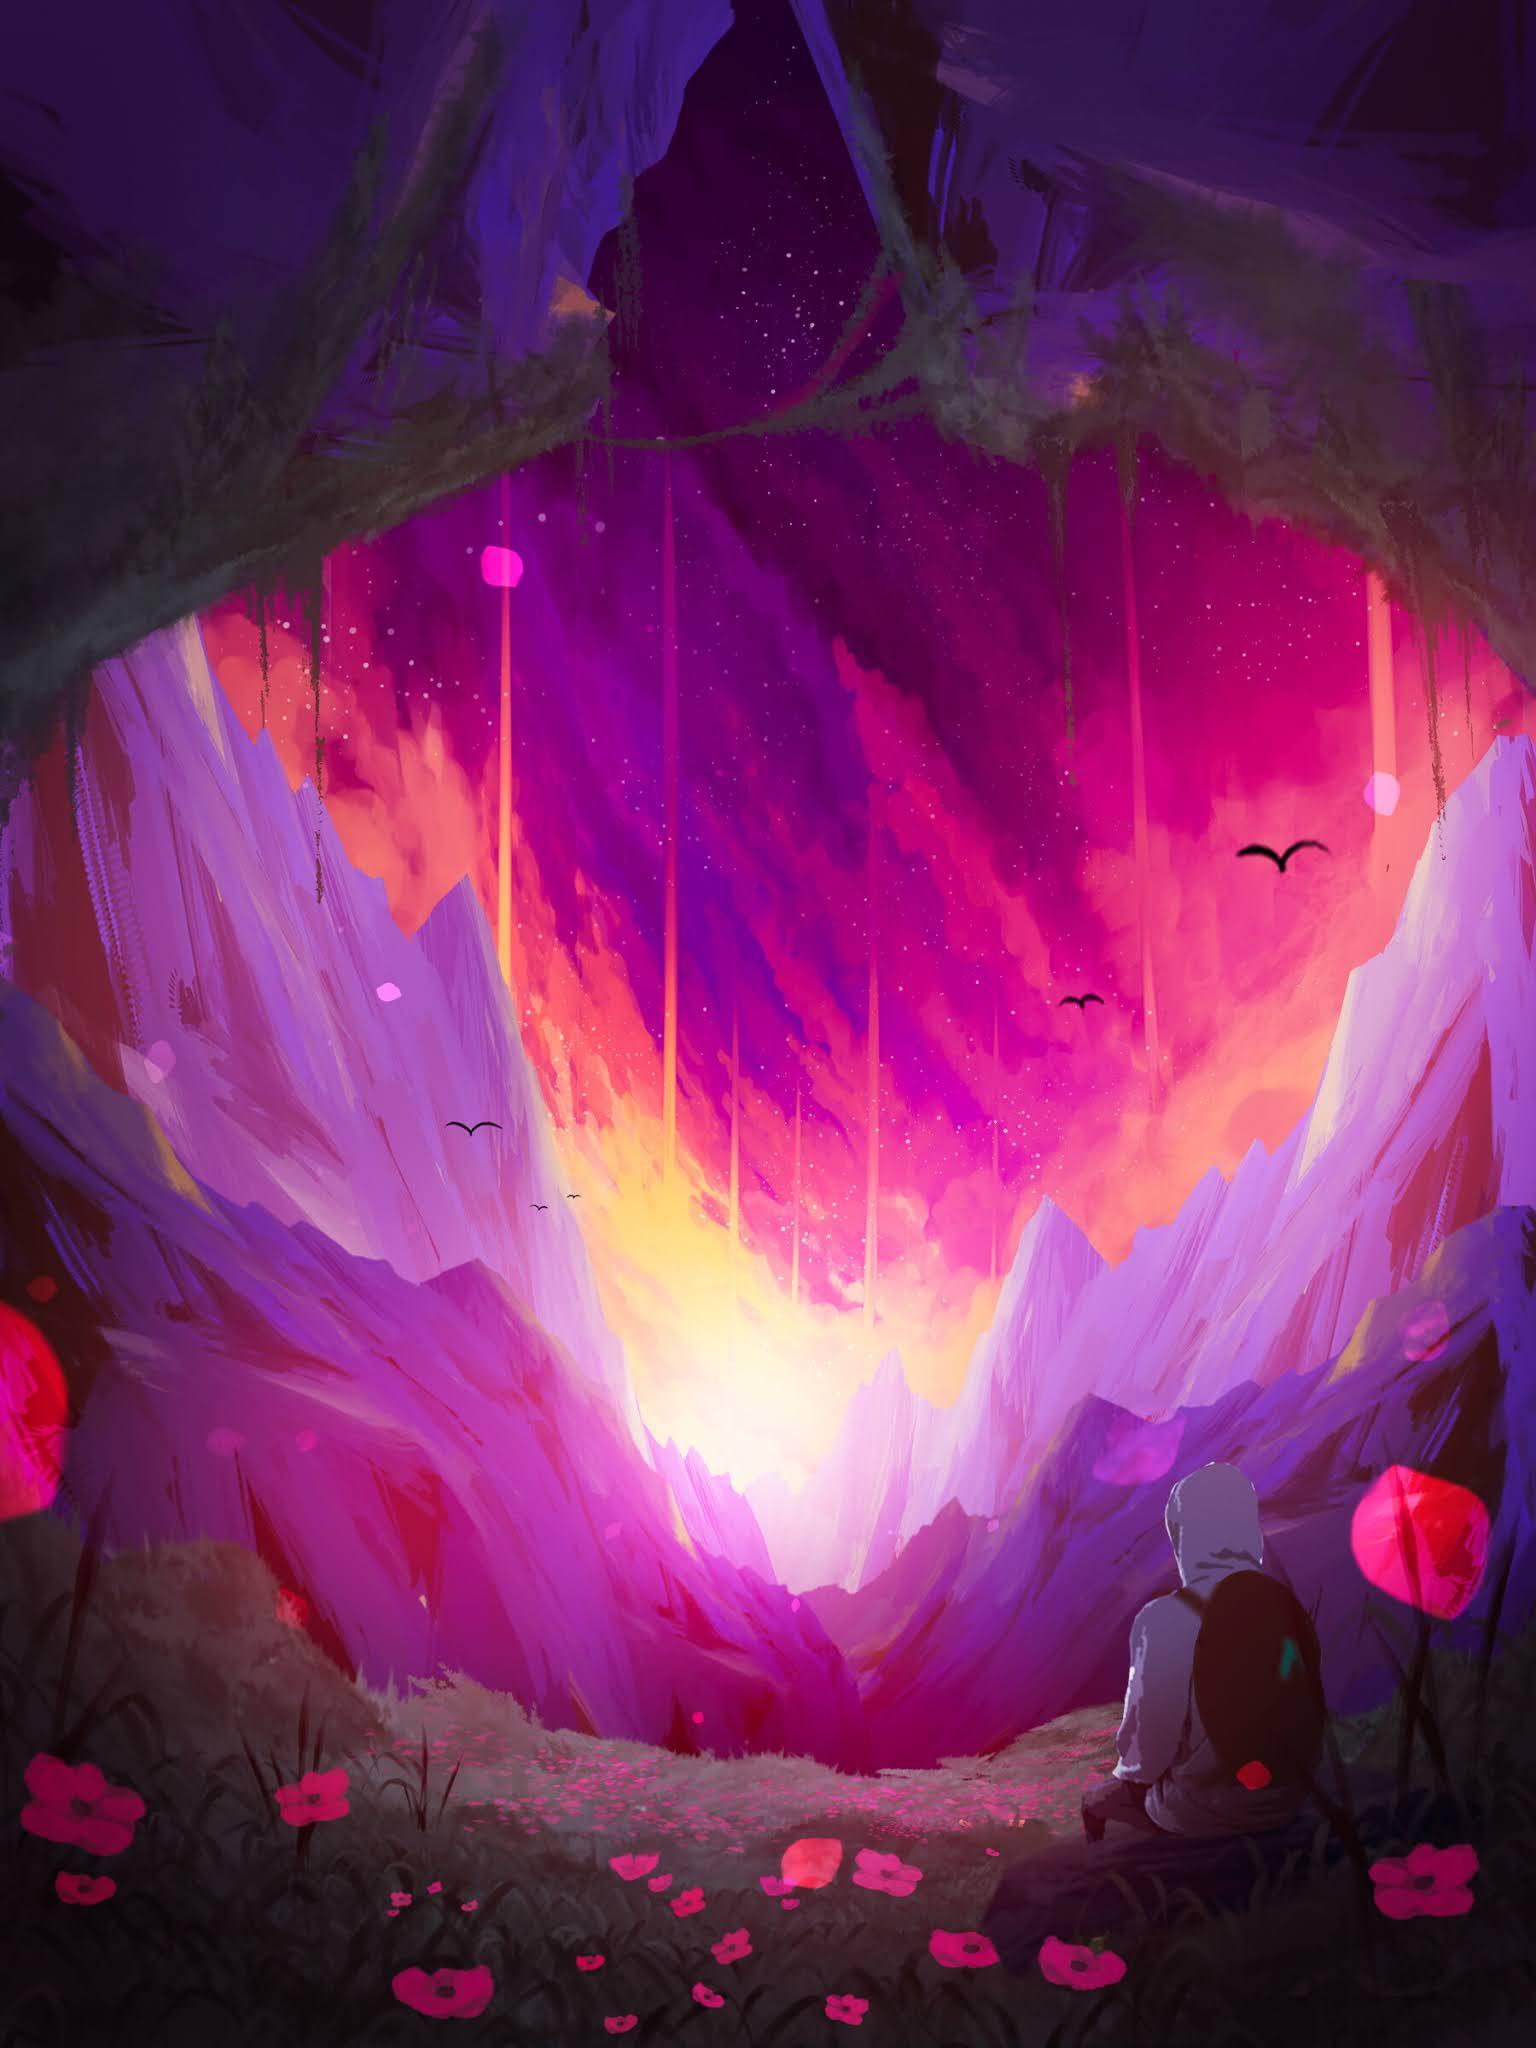 beautiful phone wallpaper purple